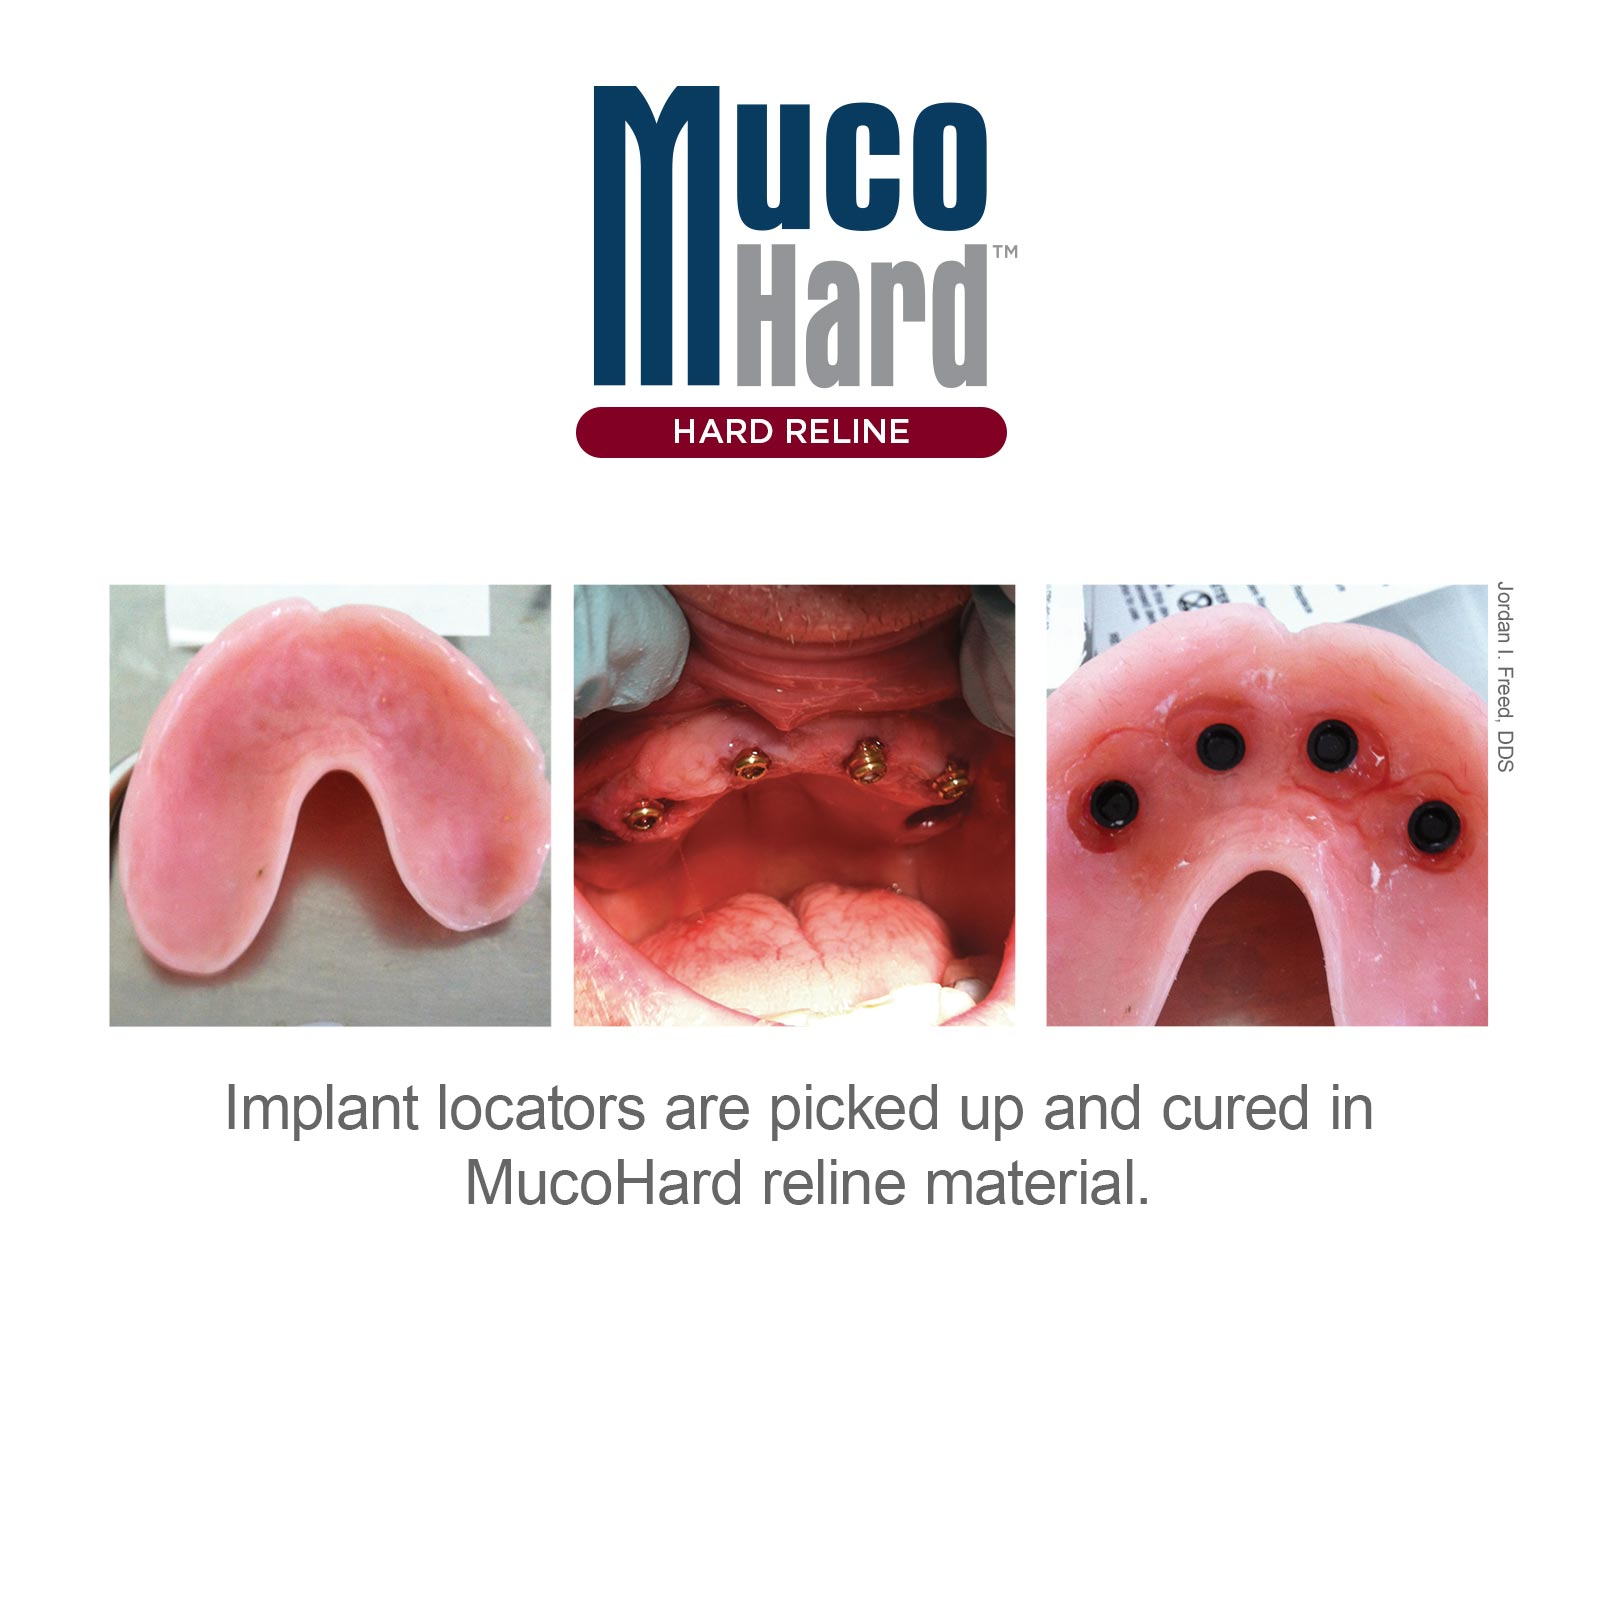 MucoHard Hard Denture Reline Clinical